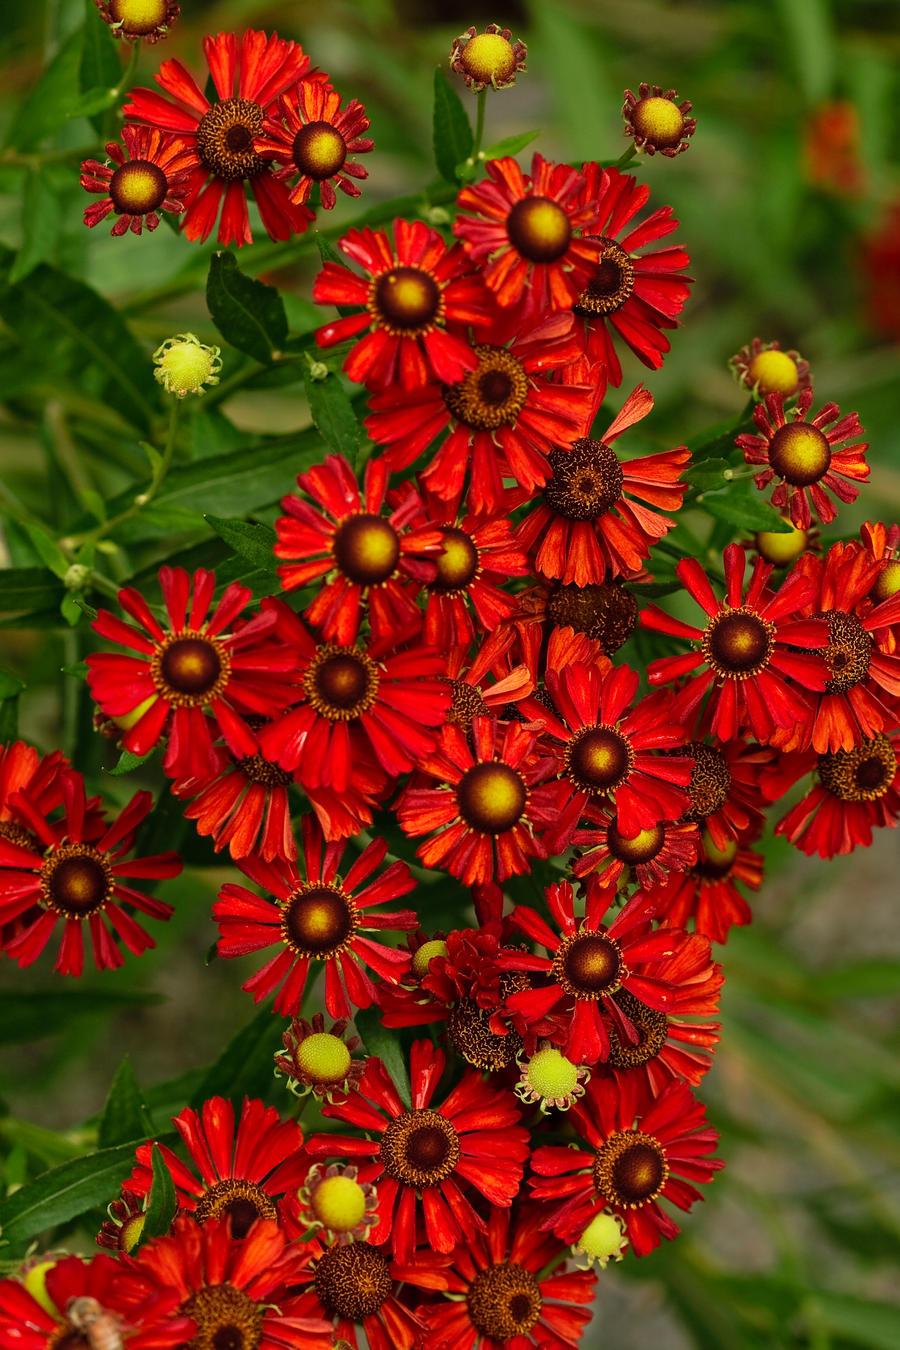 Gear Flowers by Eruwyn